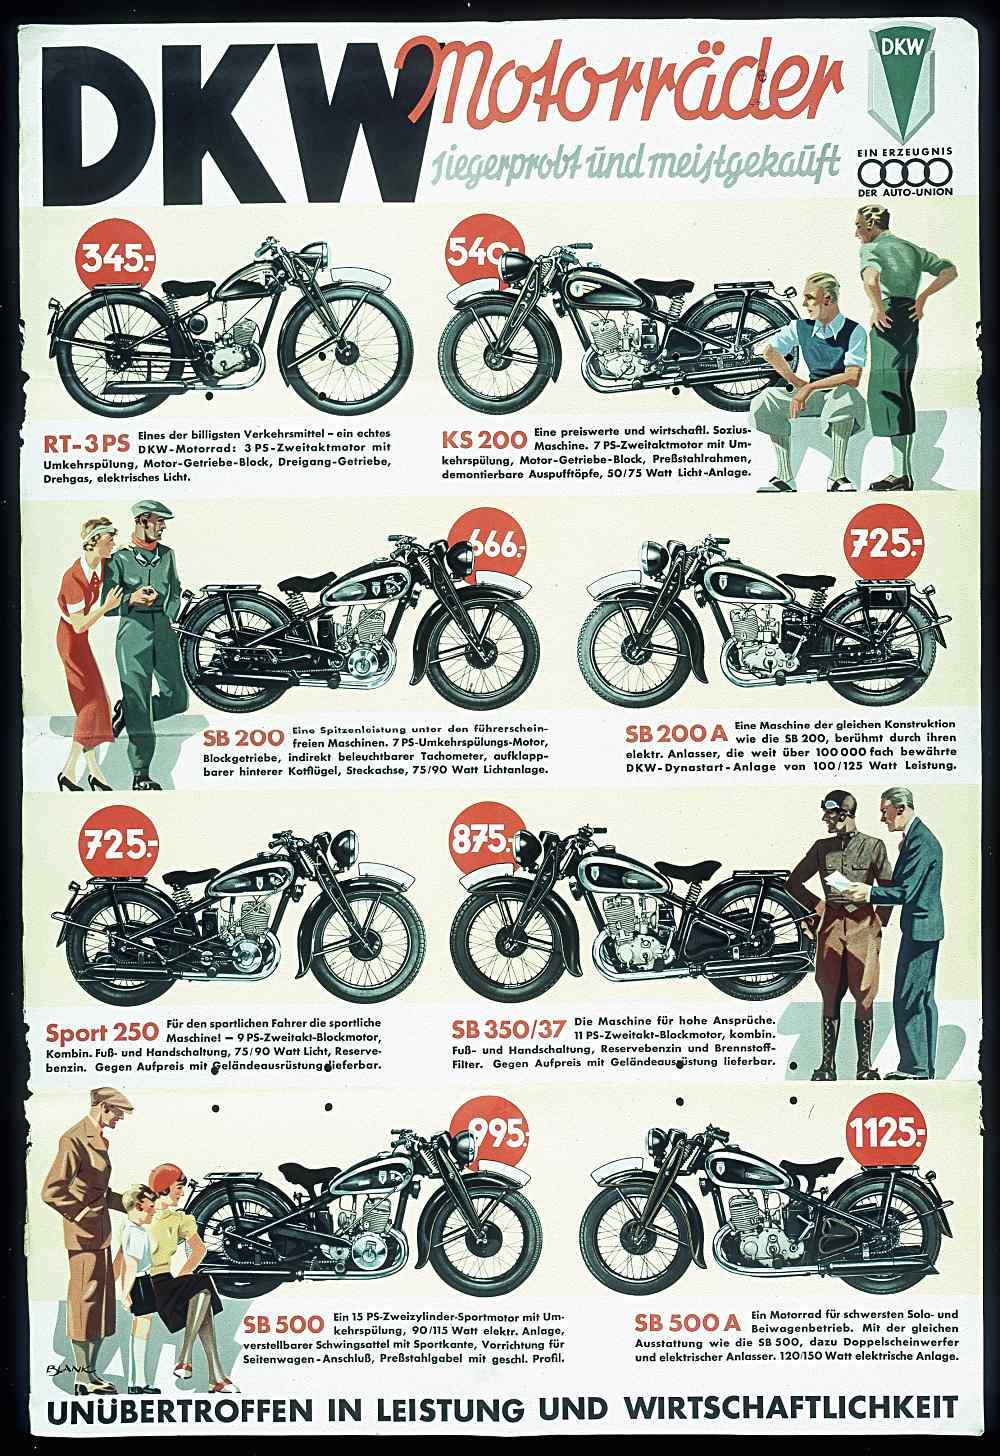 DKW Motorcycles